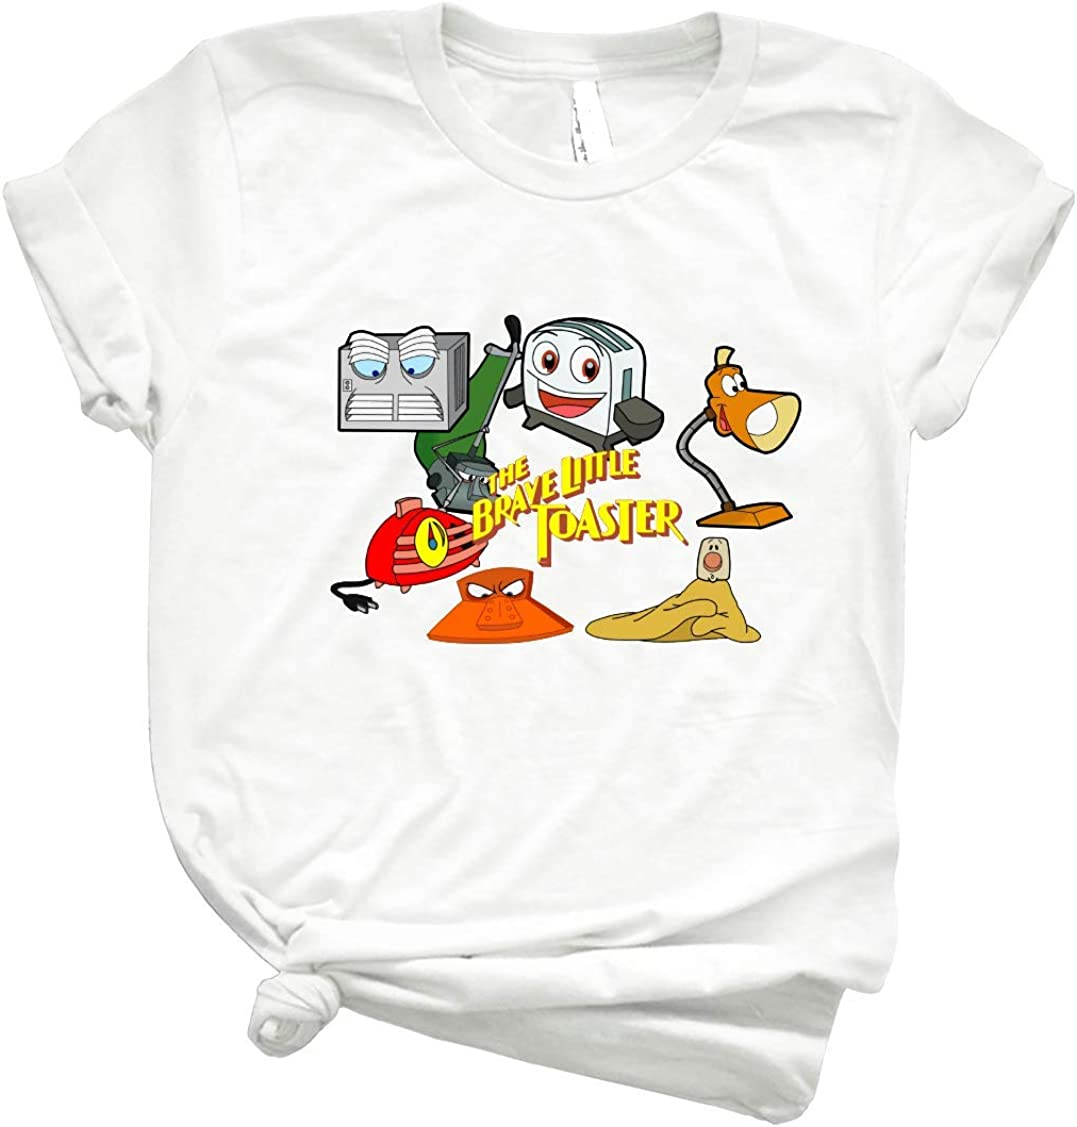 Brave Little Toaster Crew Men Graphic Tee Vintage Retro Style Shirt for Women – Customize Women Best T